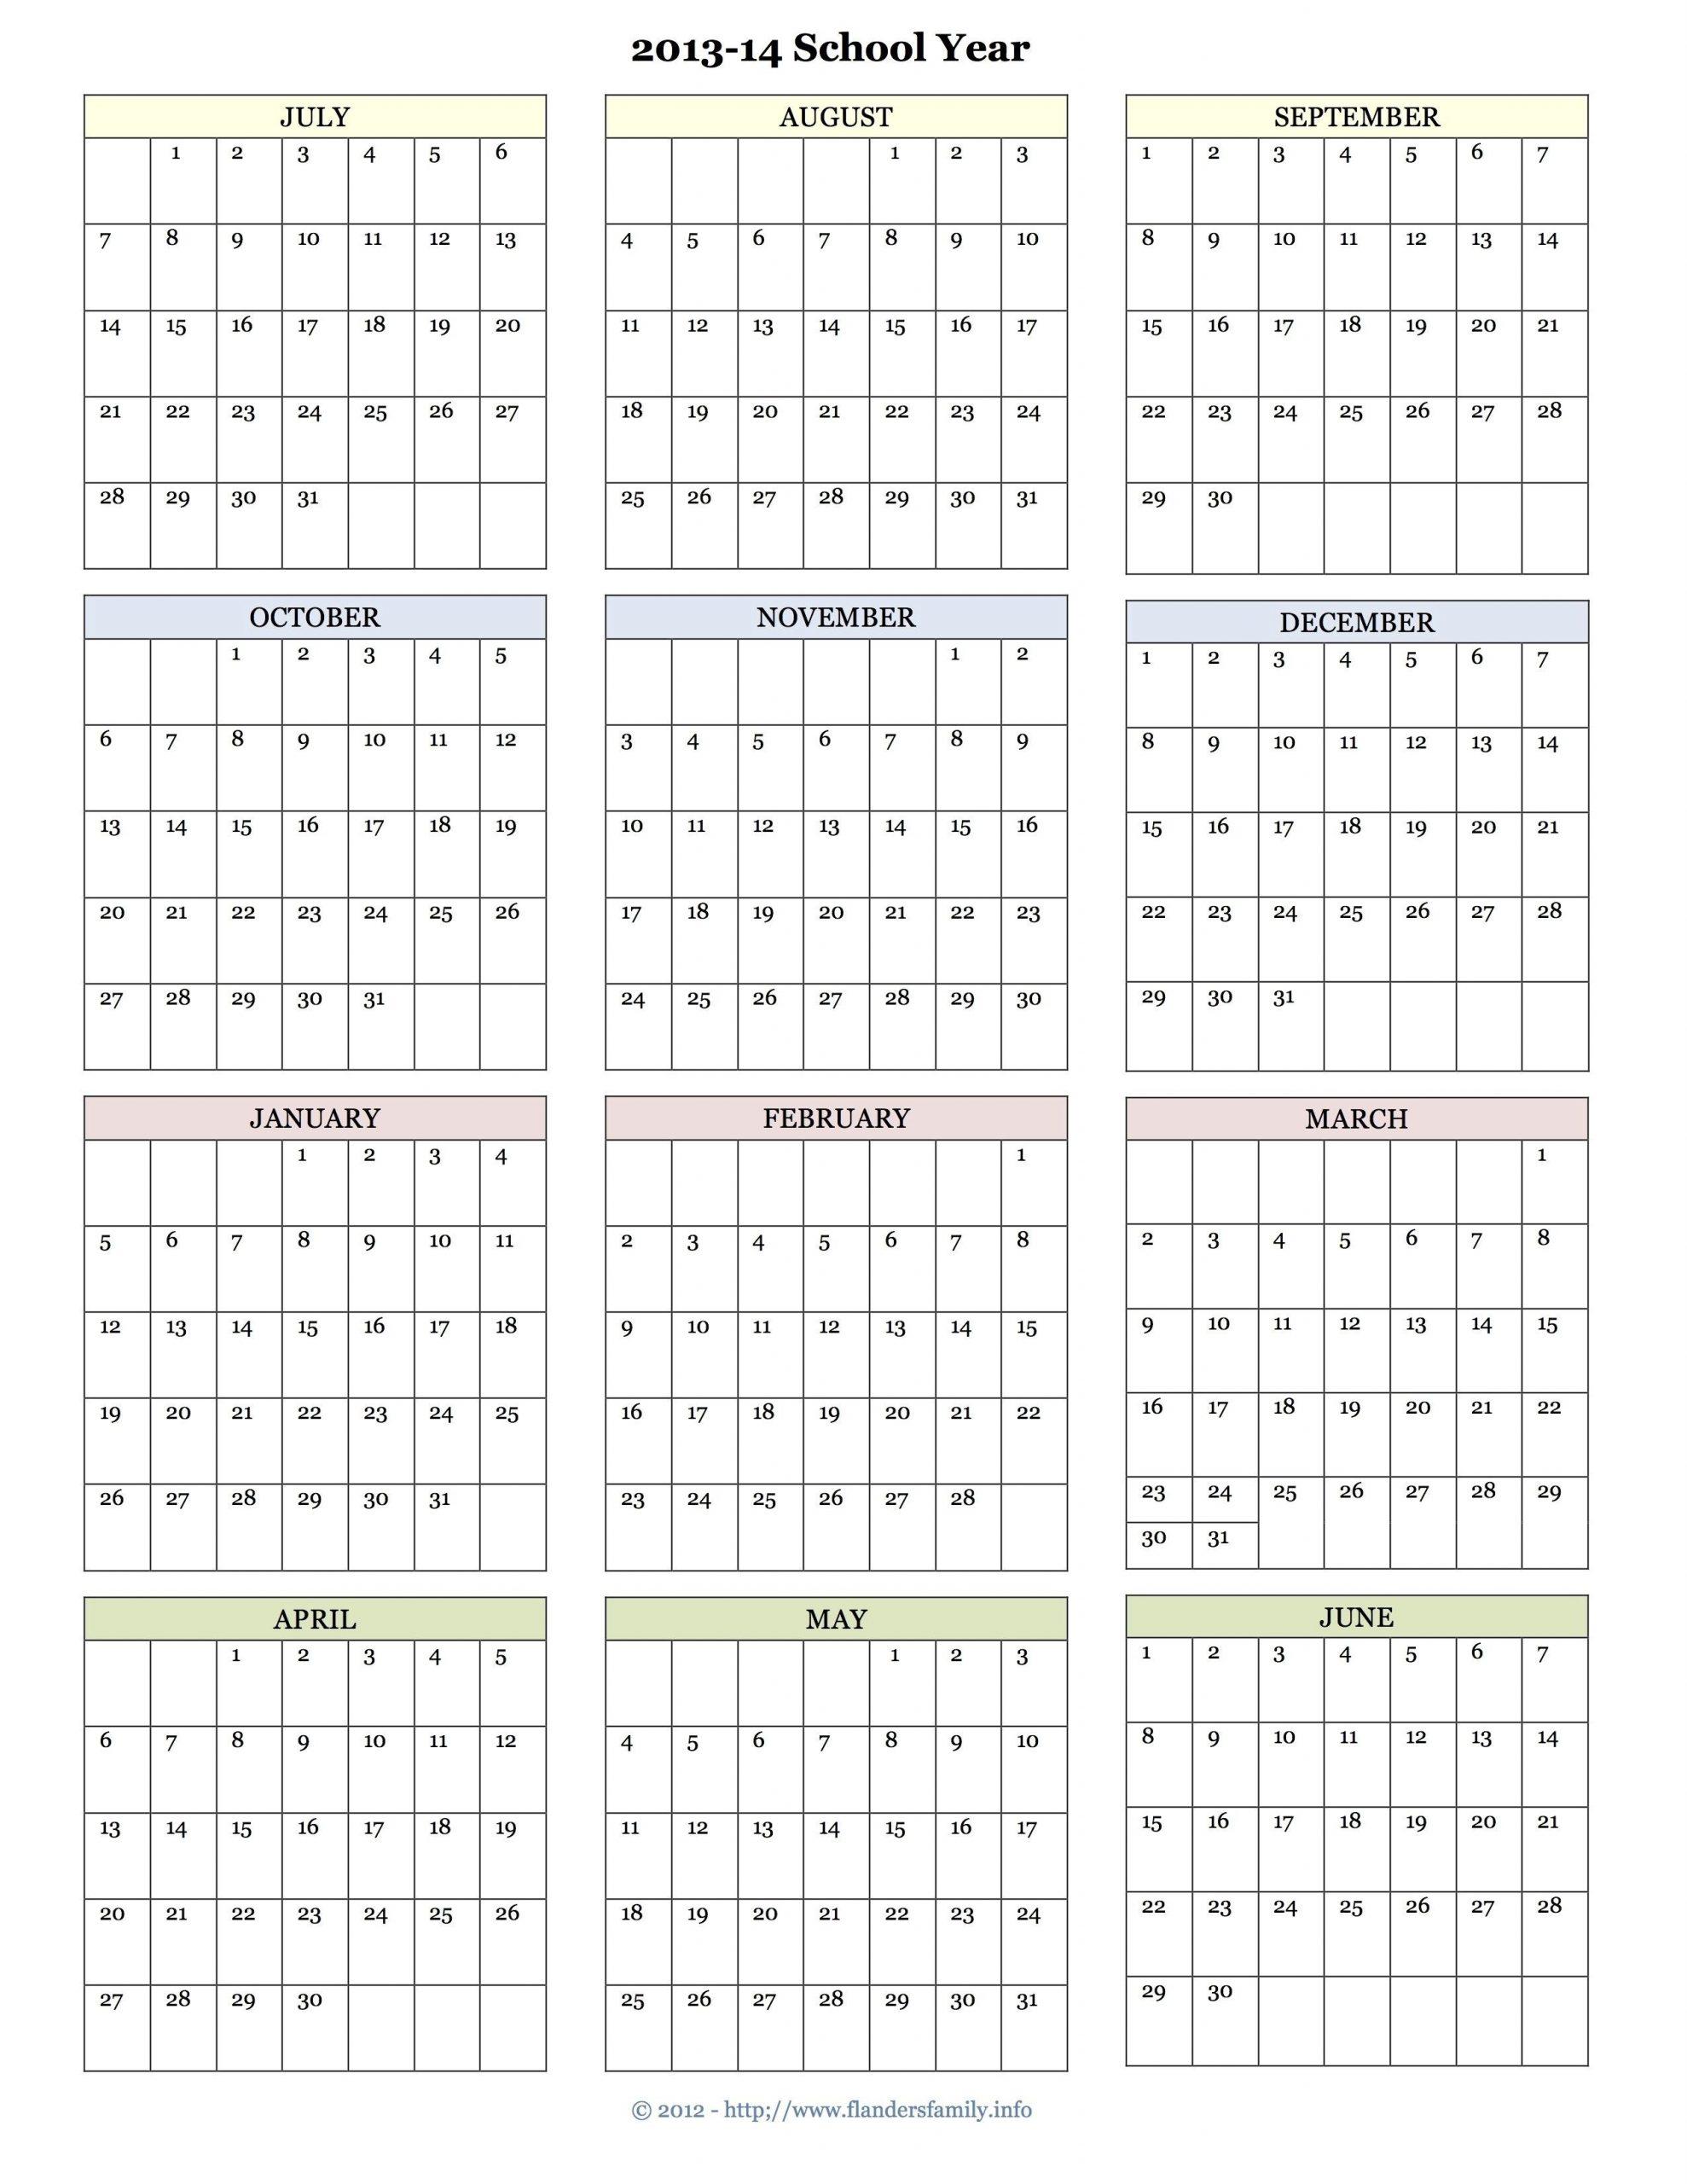 "Depo Shot Calendar 2019 Depo Provera Injection Calendar 2018  ""Depo Provera"" And ""Printable Calendar"" And 2021"